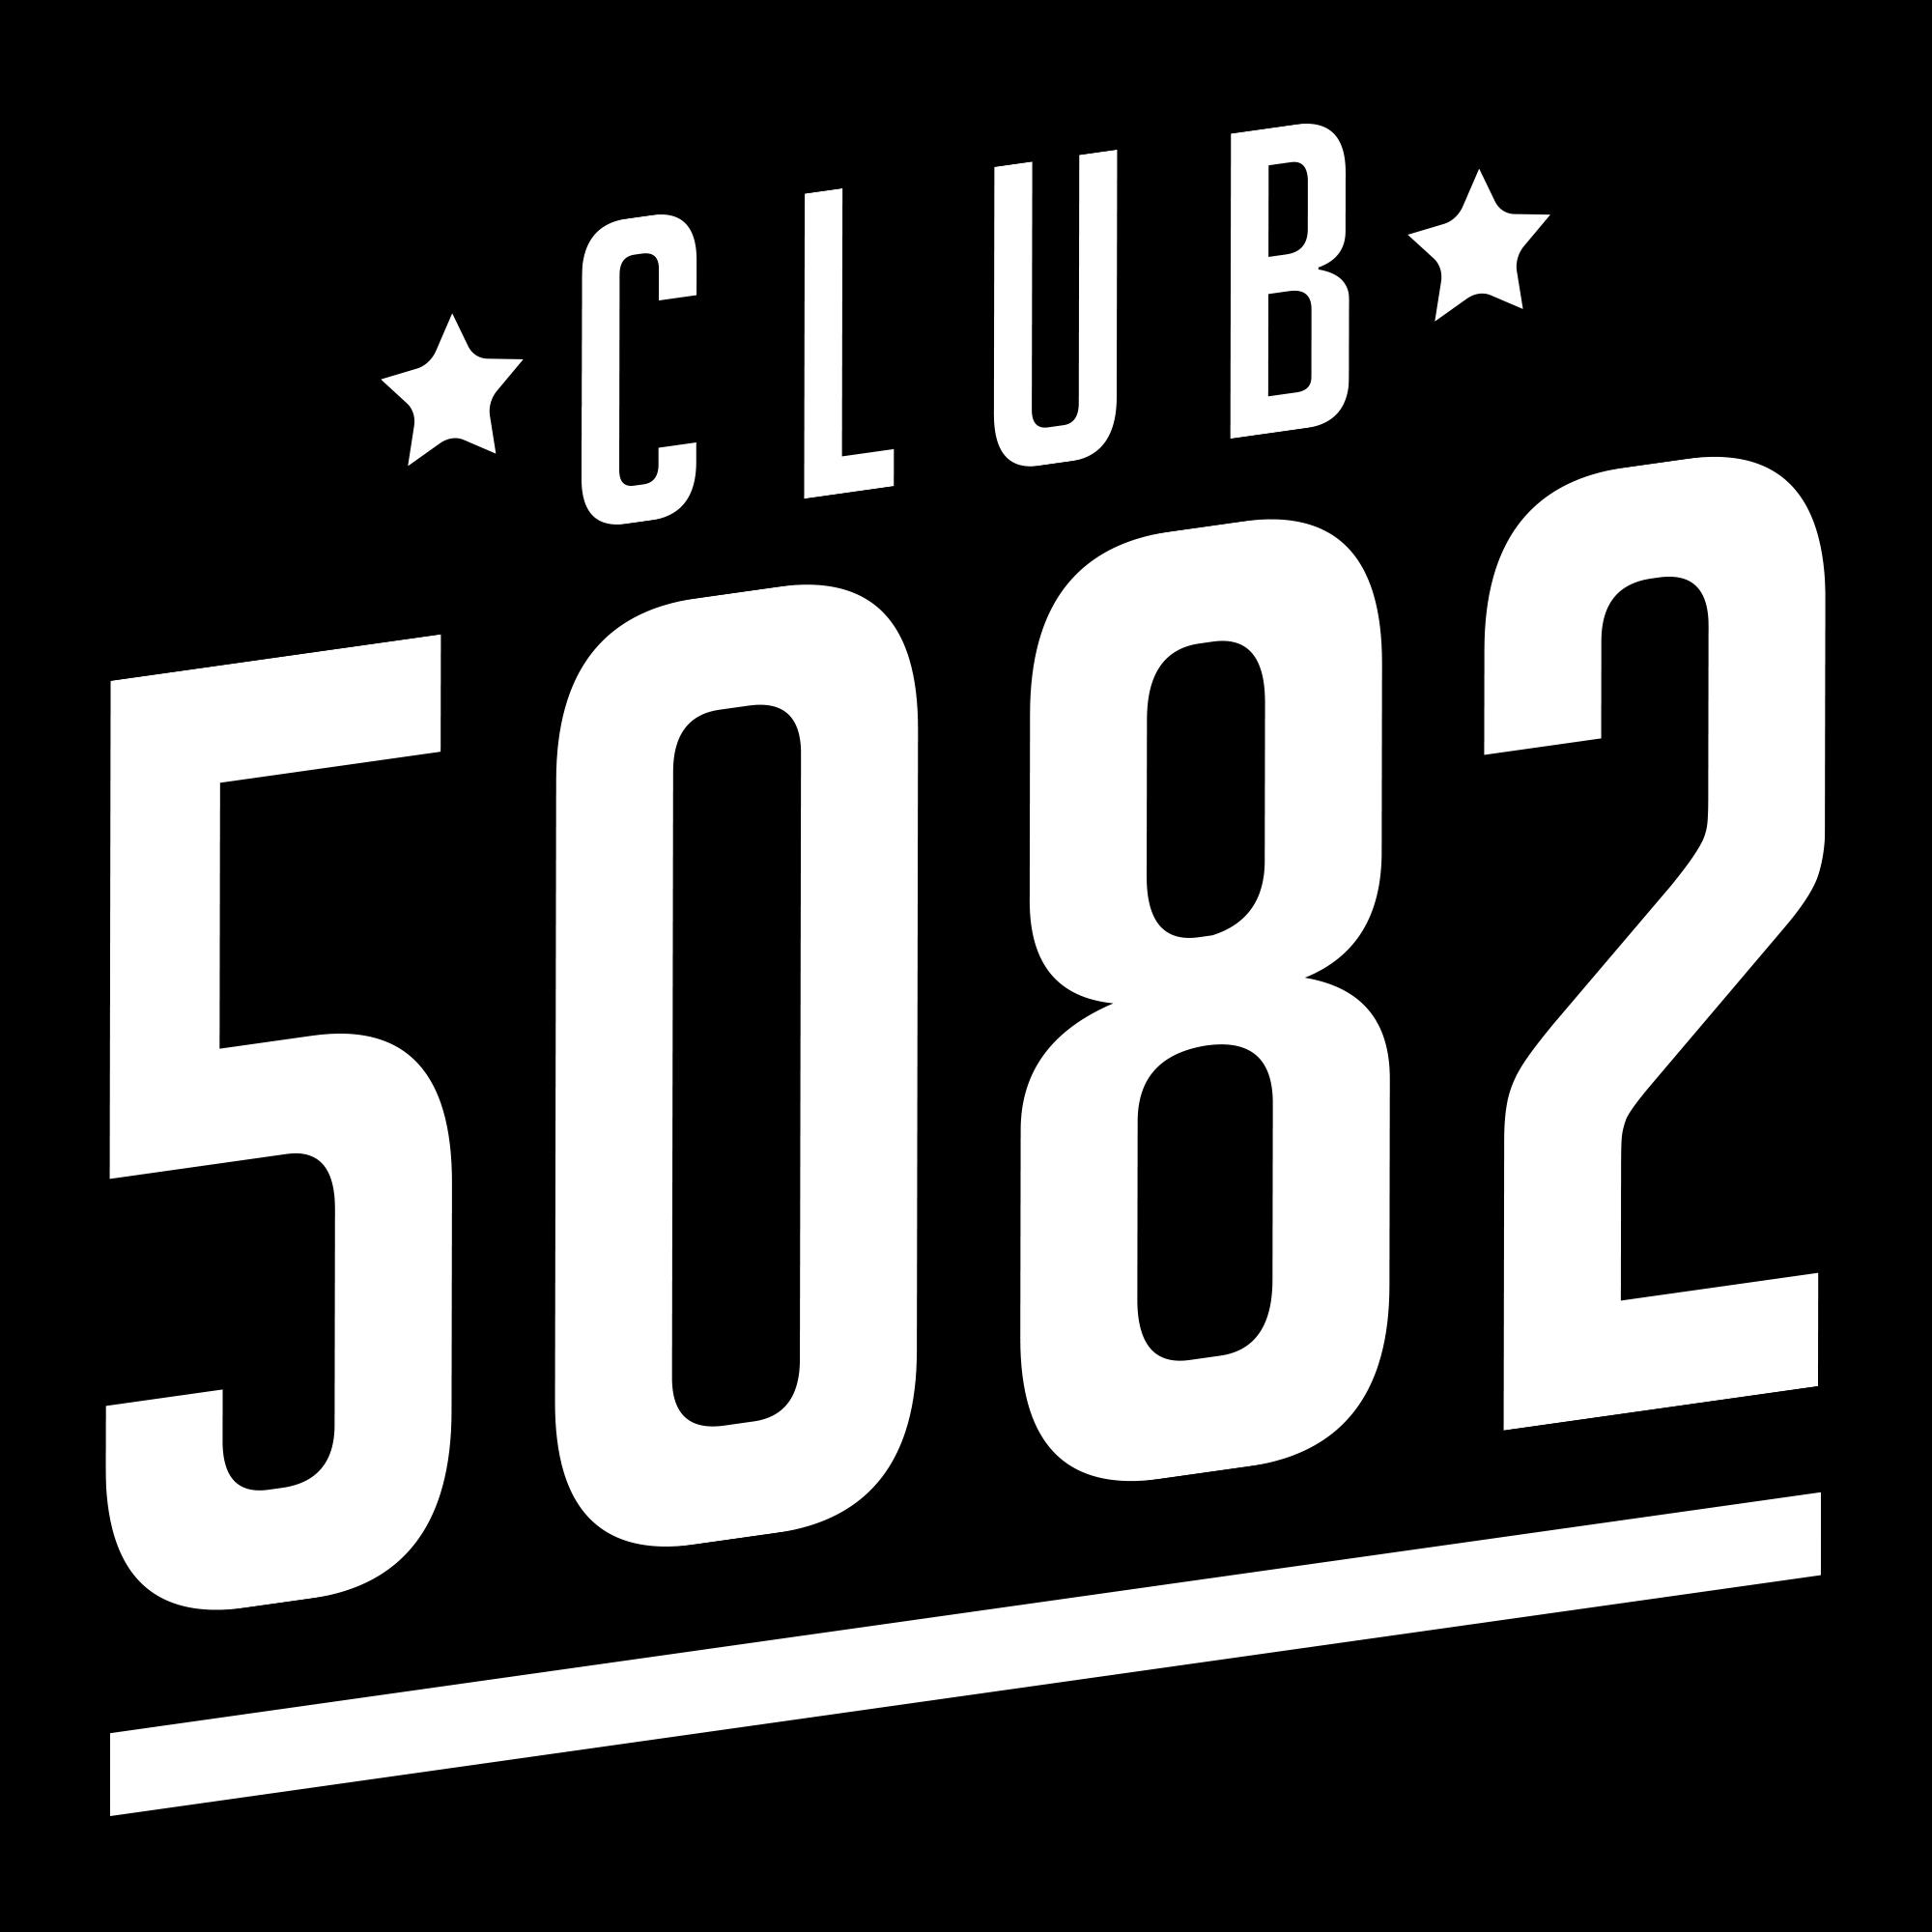 Club5082